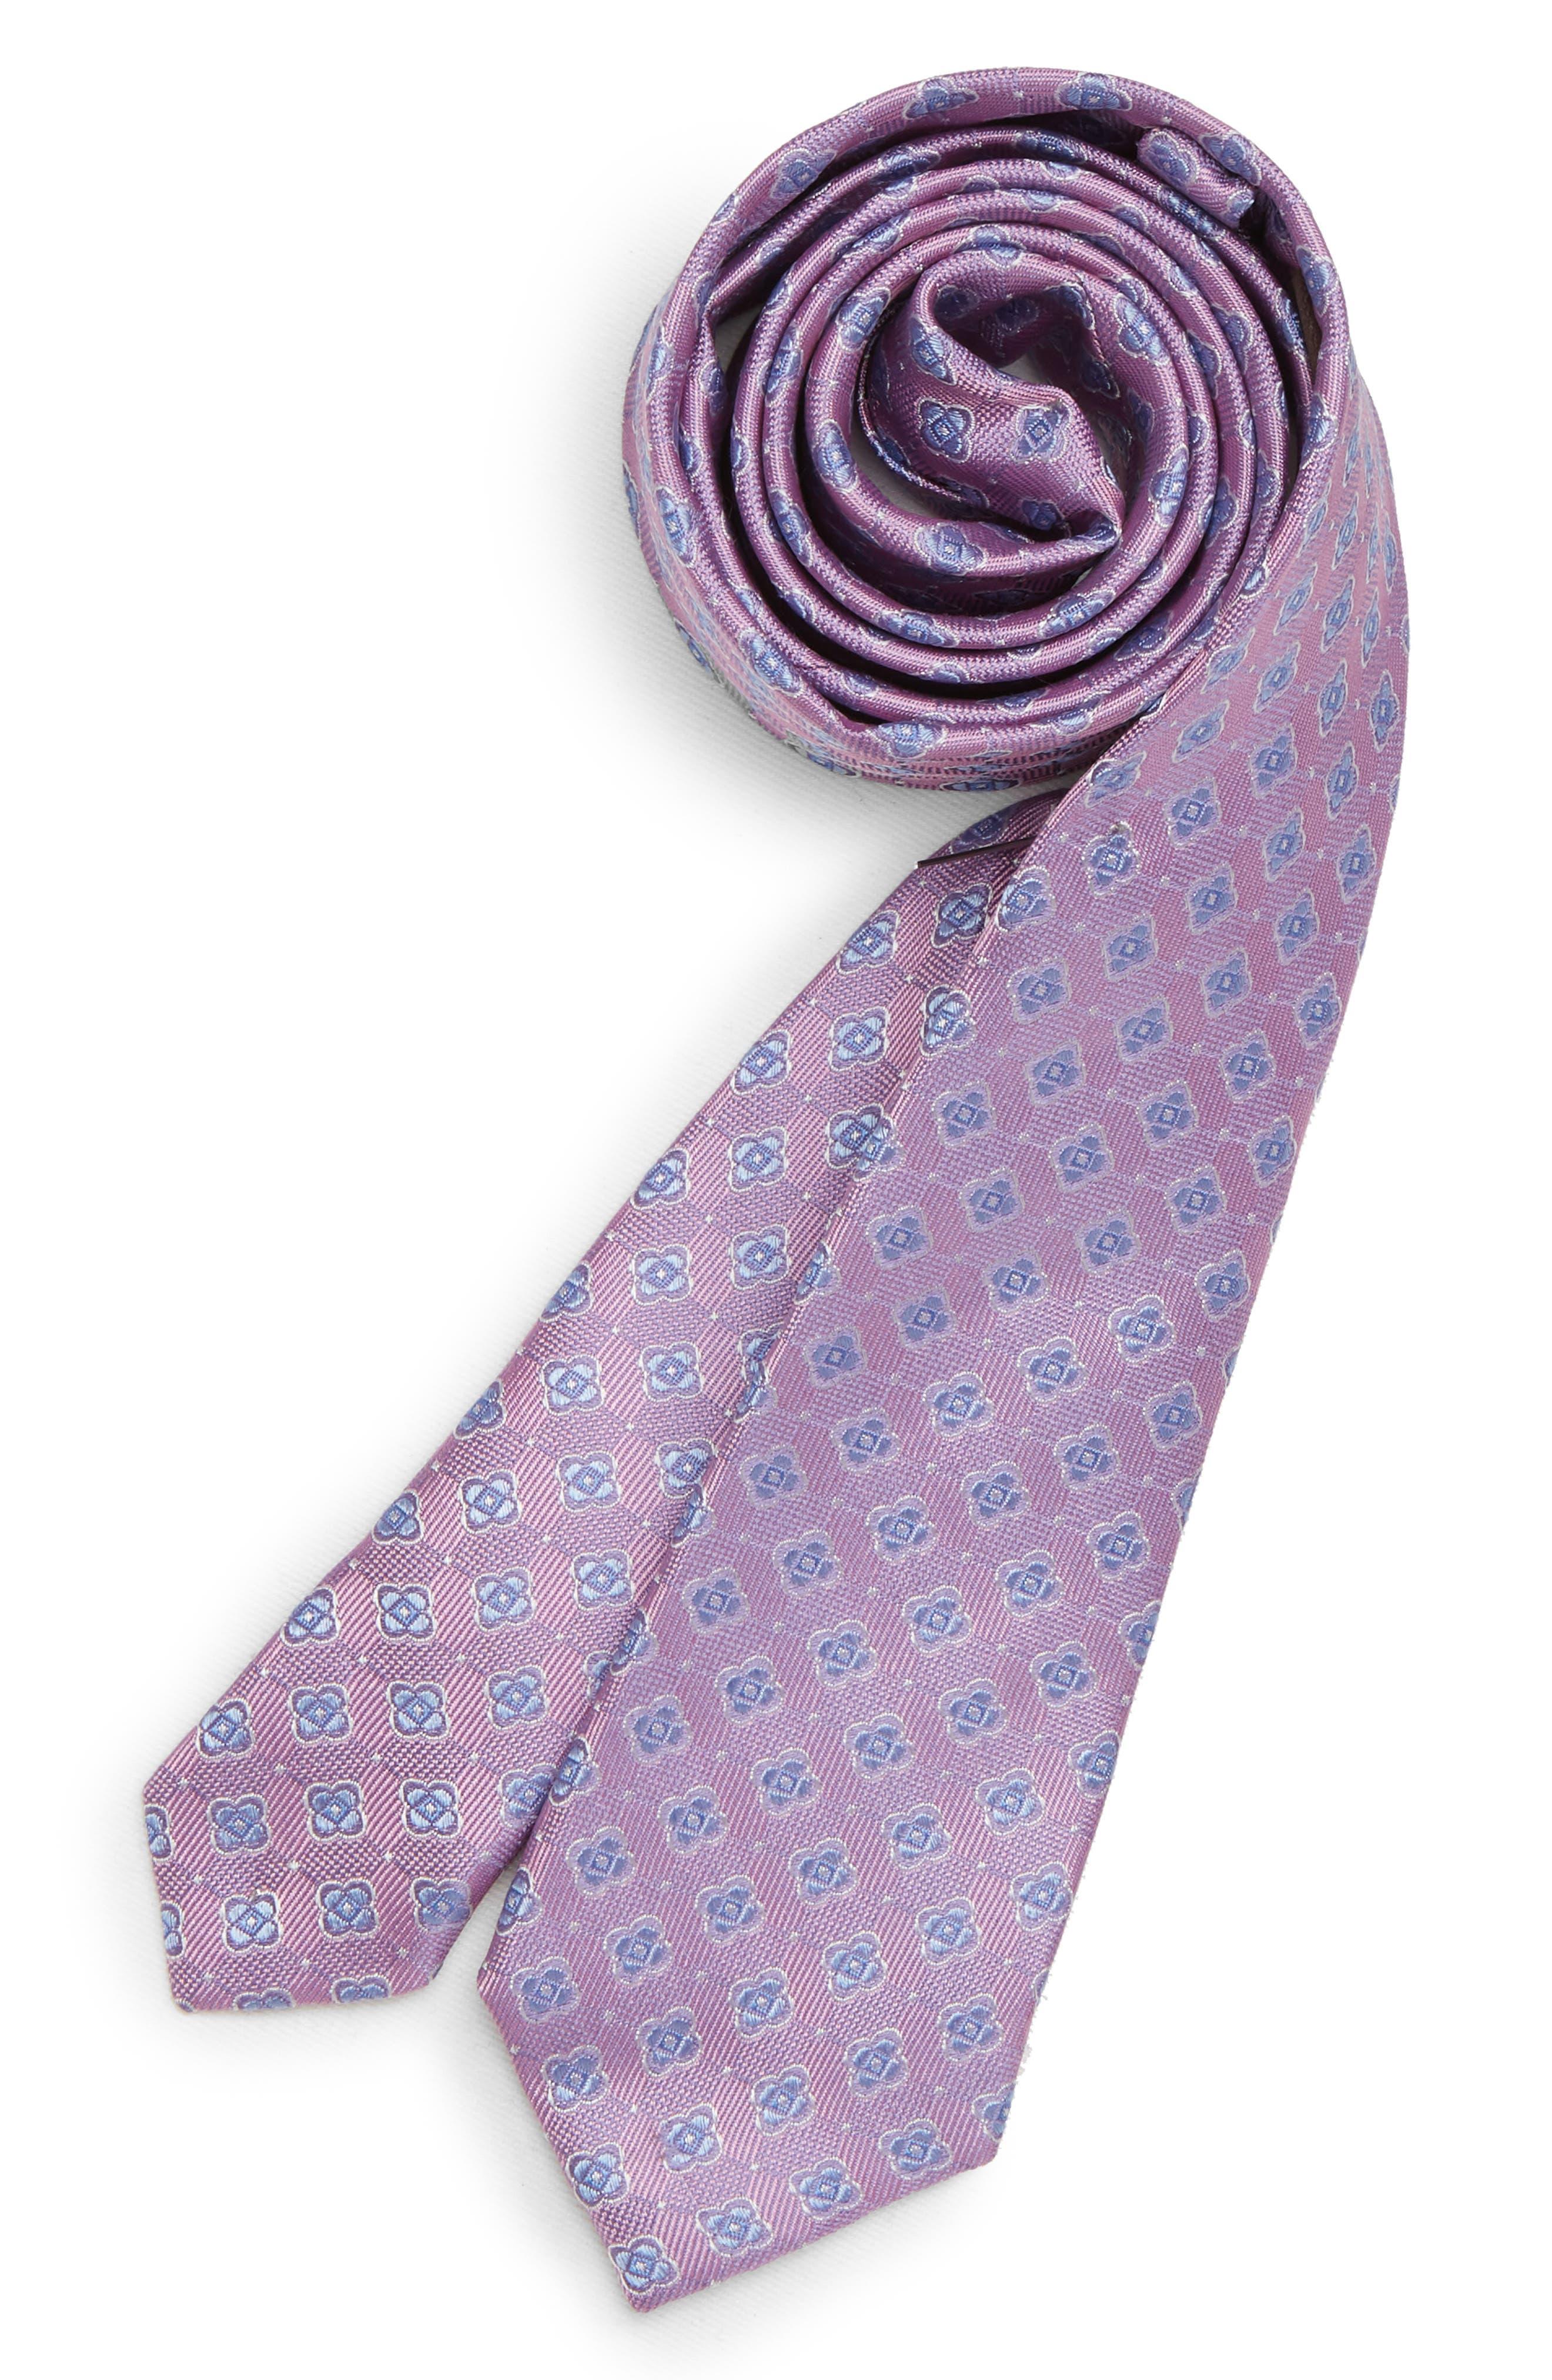 MICHAEL KORS Medallion Silk Tie, Main, color, 650